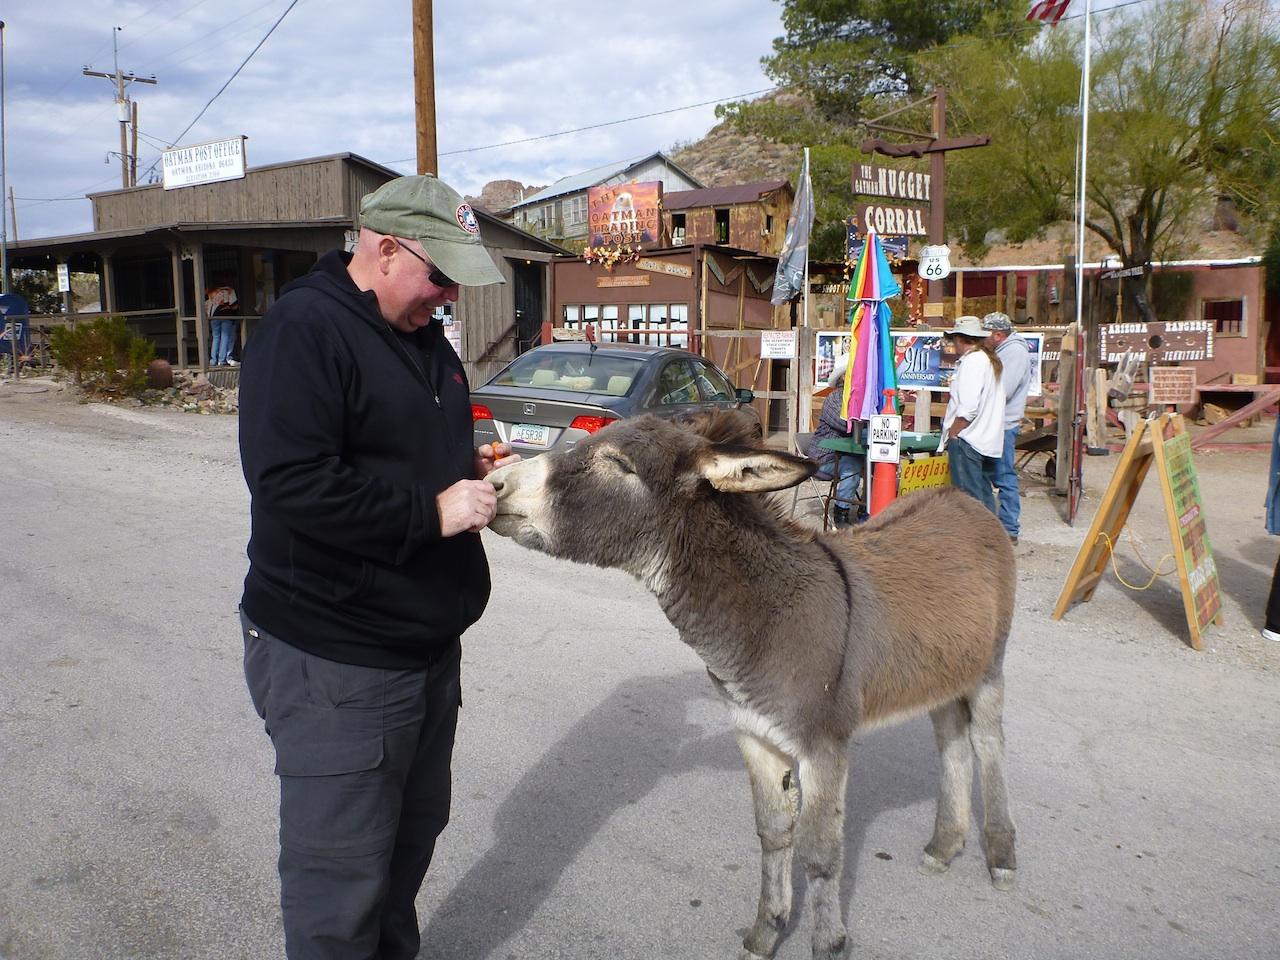 David Feeding A Burro In Oatman, AZ